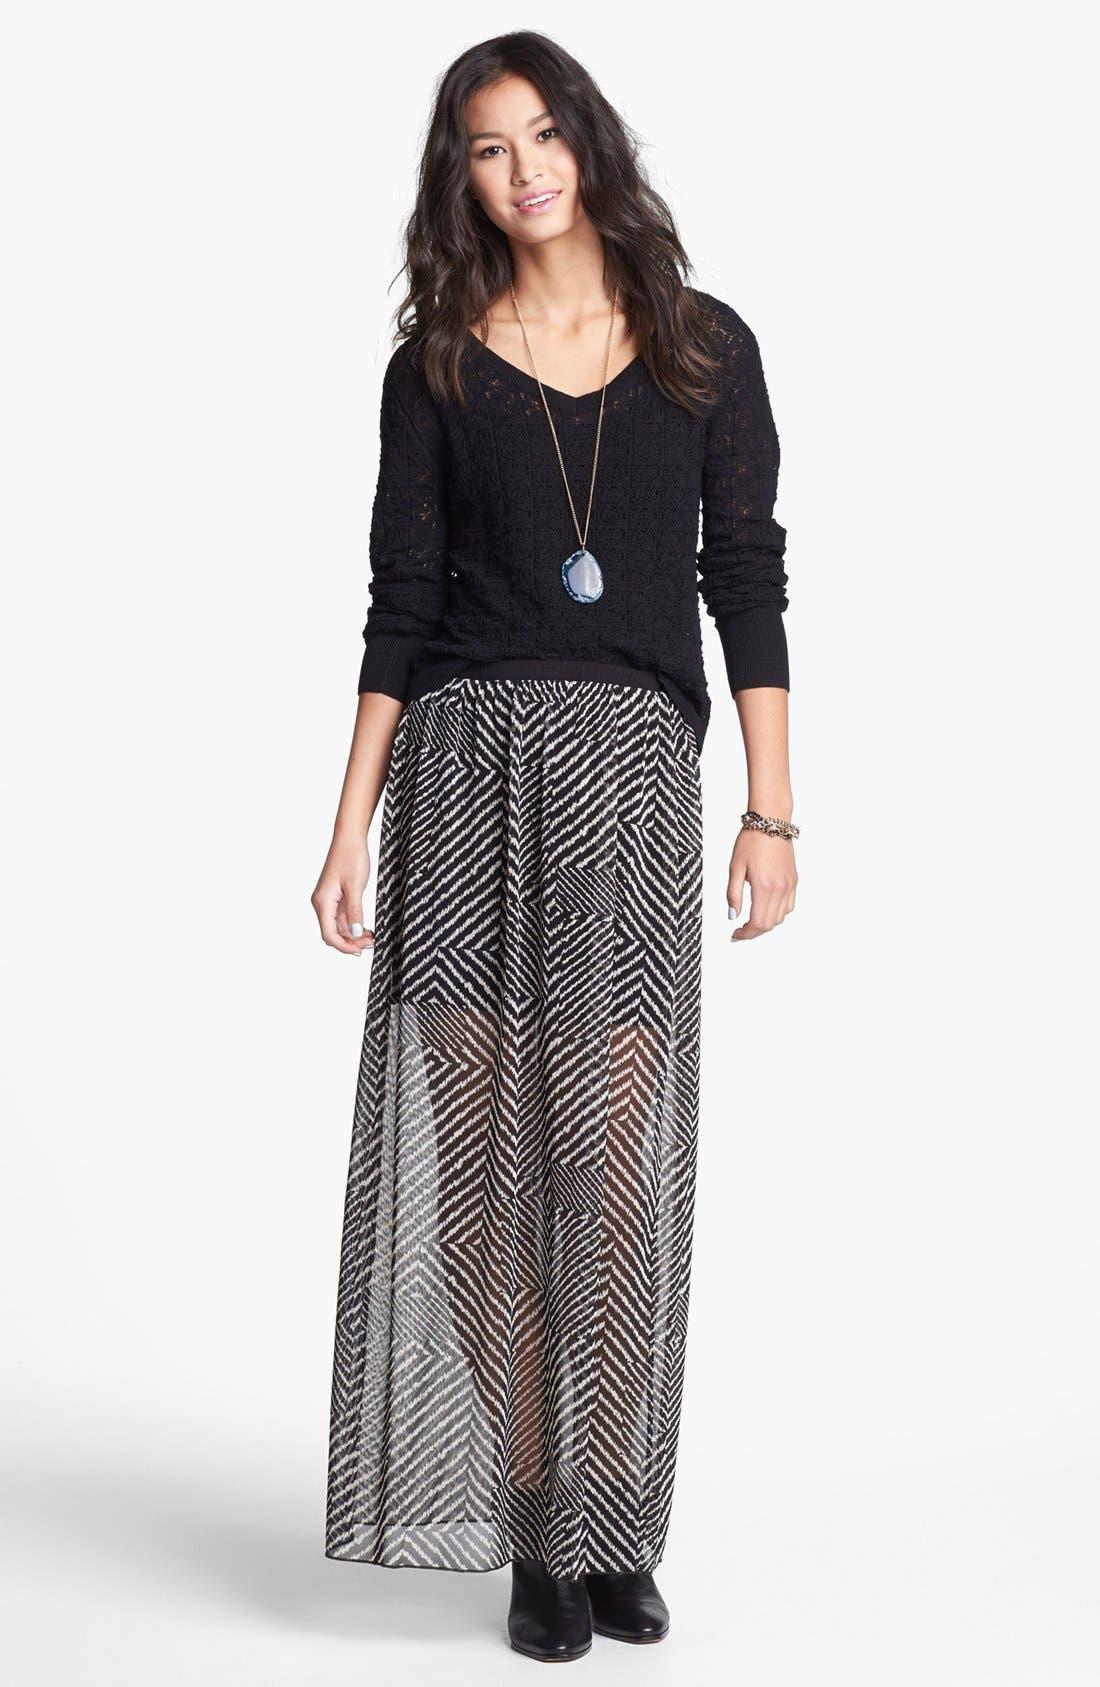 Alternate Image 1 Selected - h.i.p. Print Chiffon Maxi Skirt (Juniors)